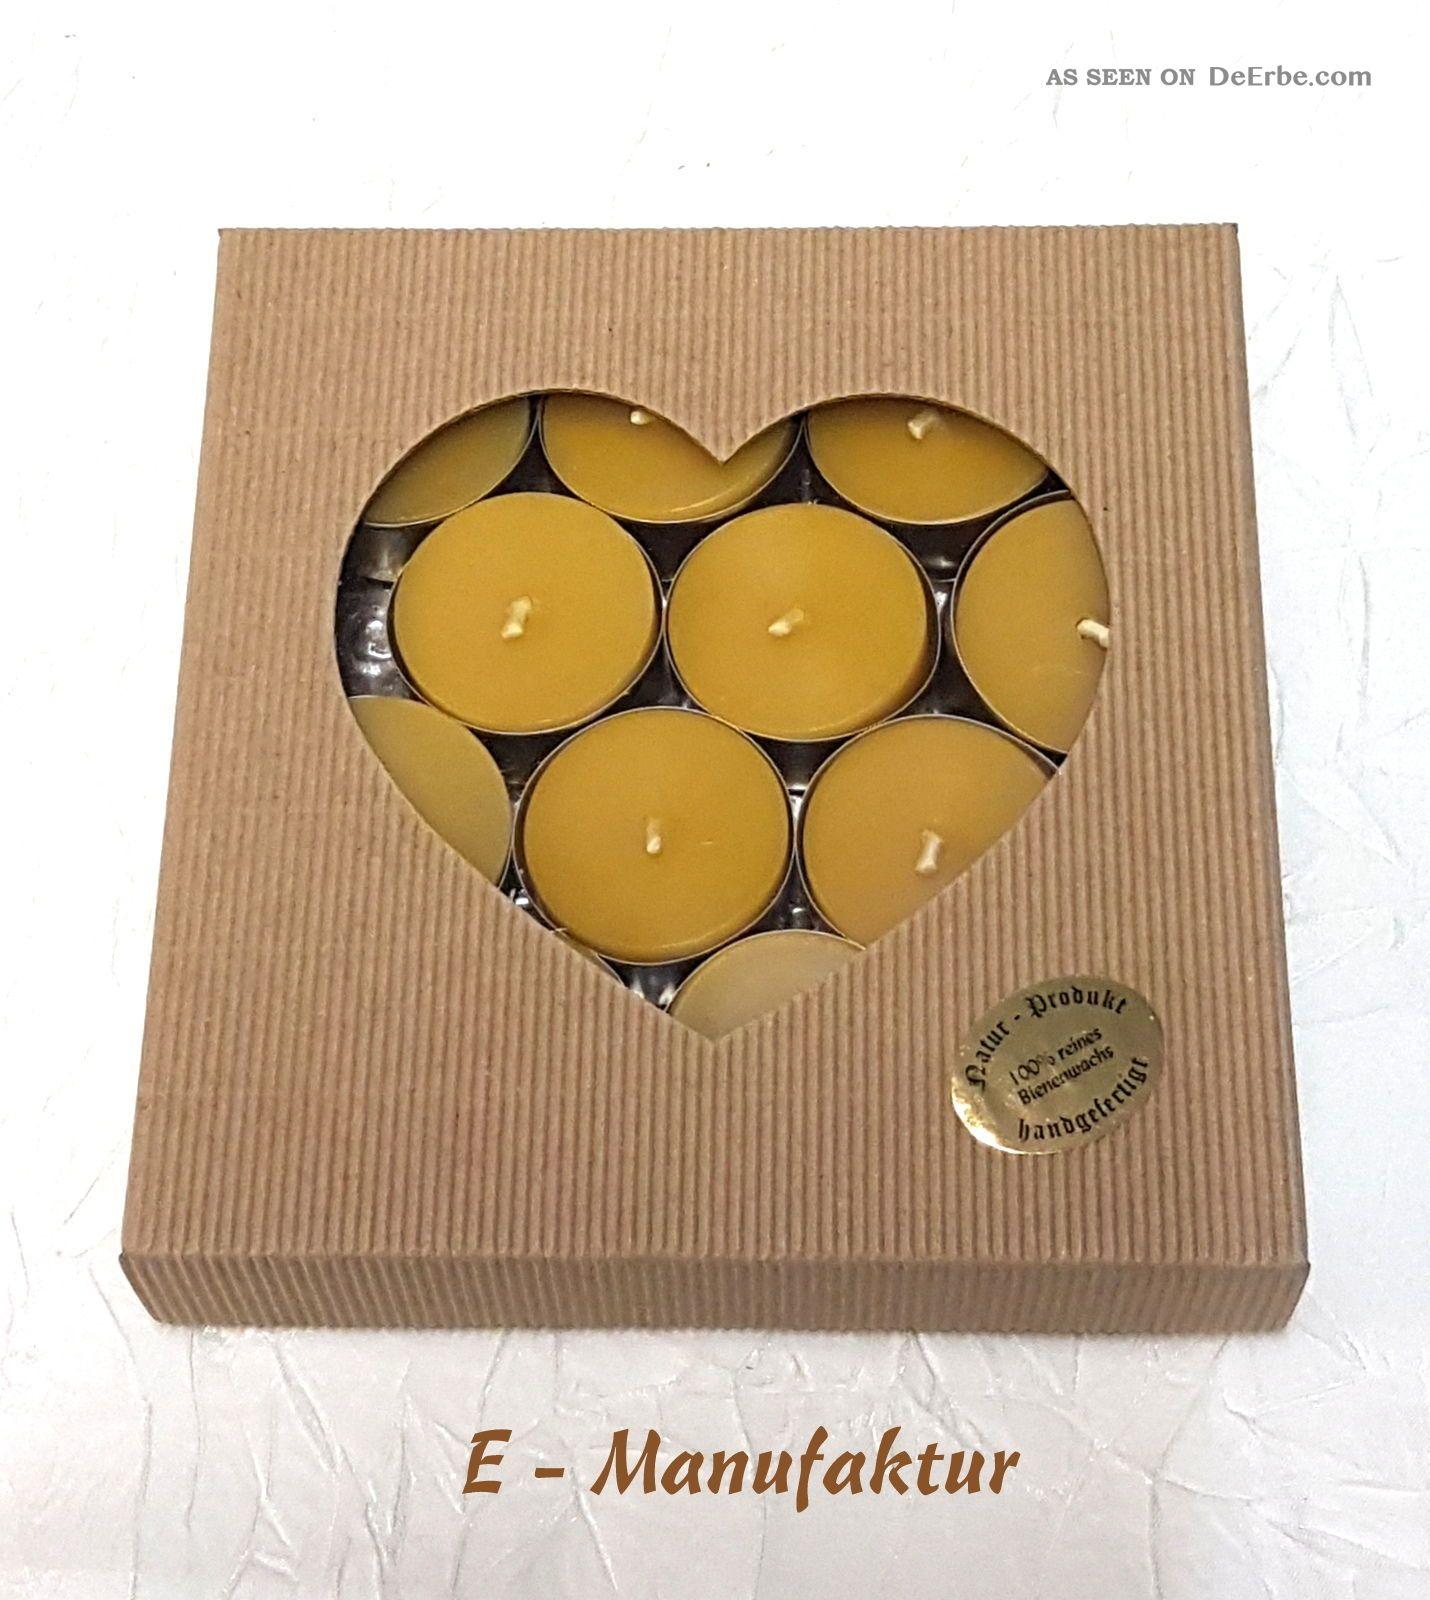 bienenwachskerzen 12 st ck teelichter aus 100 echtem bienenwachs in goldenen. Black Bedroom Furniture Sets. Home Design Ideas